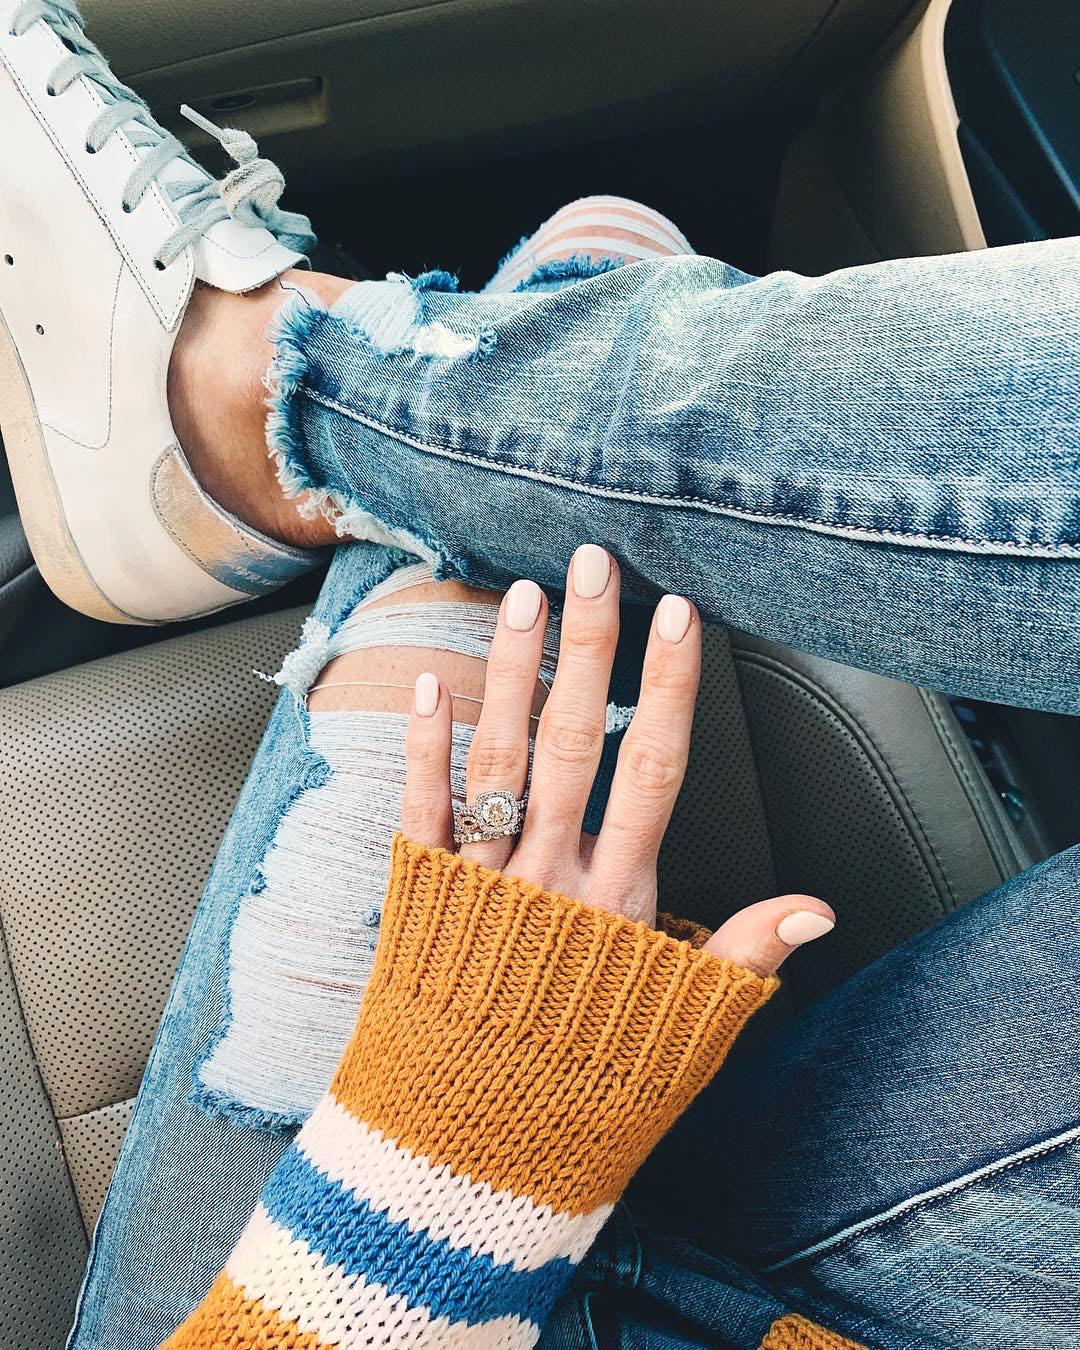 engagement ring selfie sitting in car